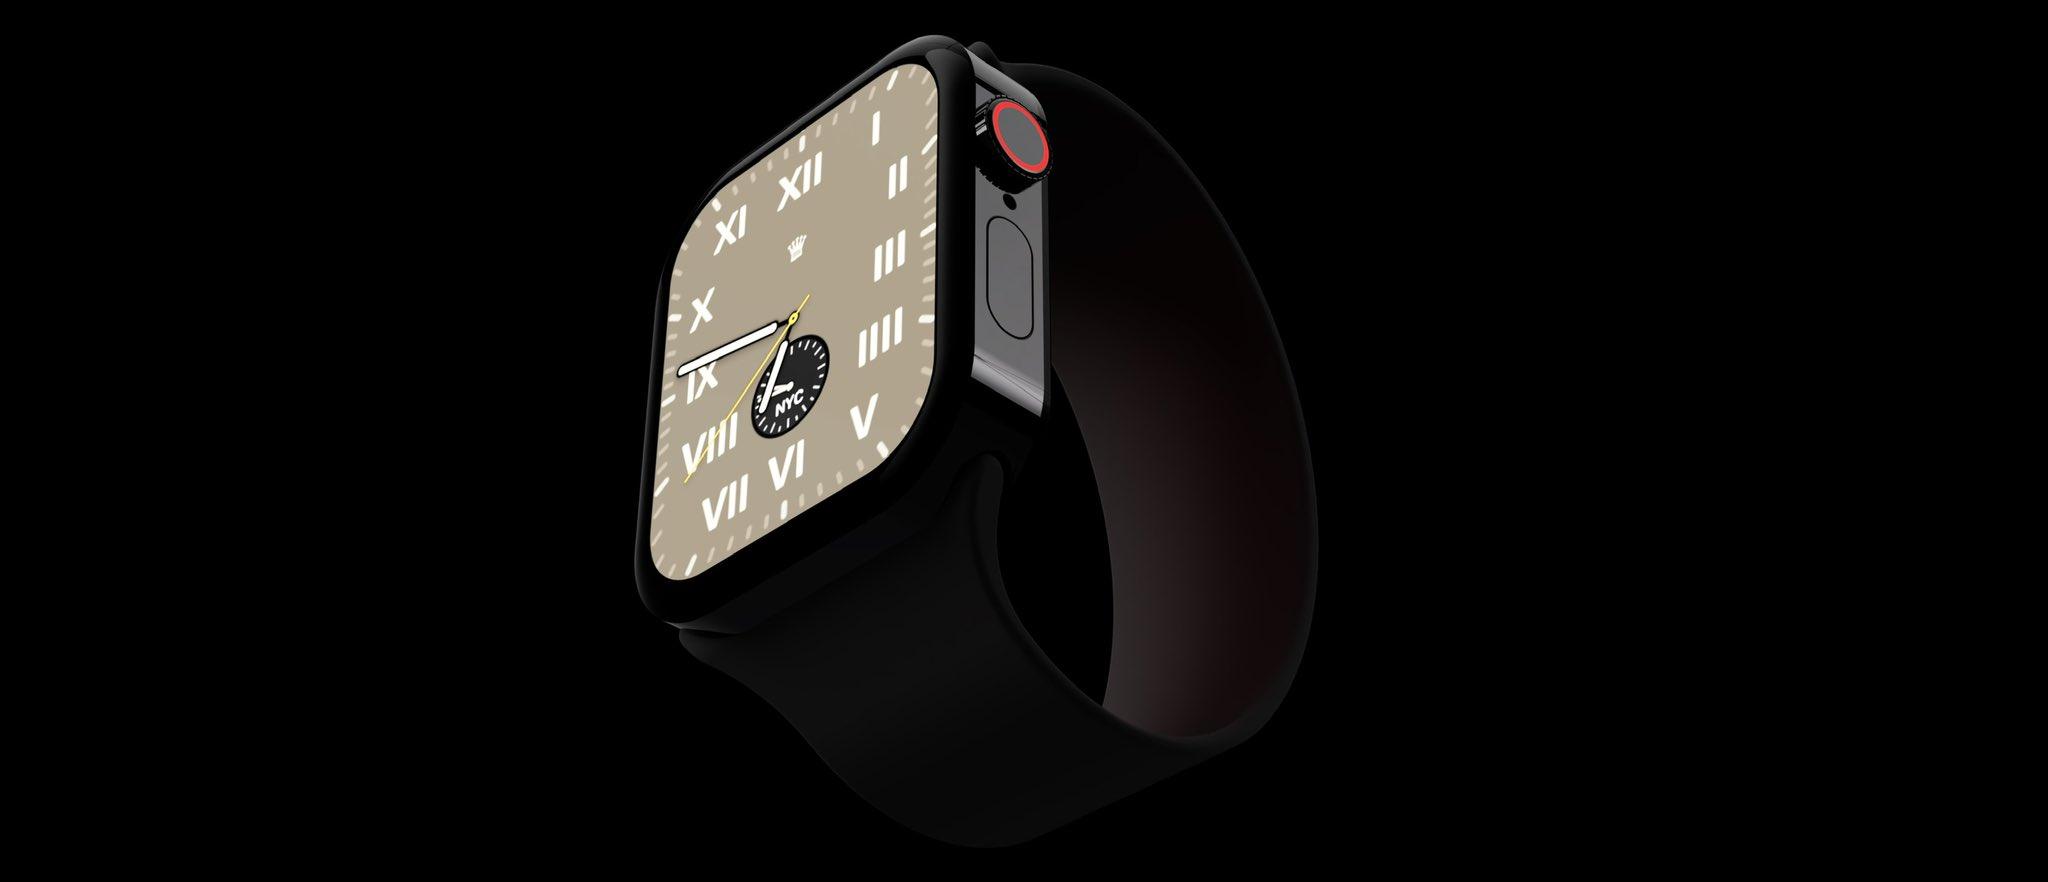 Apple watch 7 face